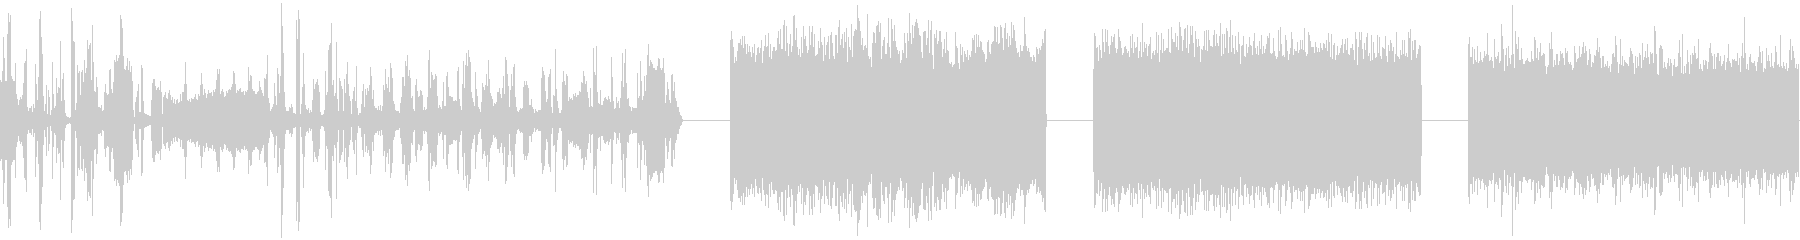 AM RADIO、SCAN、NOI...の未再生の波形